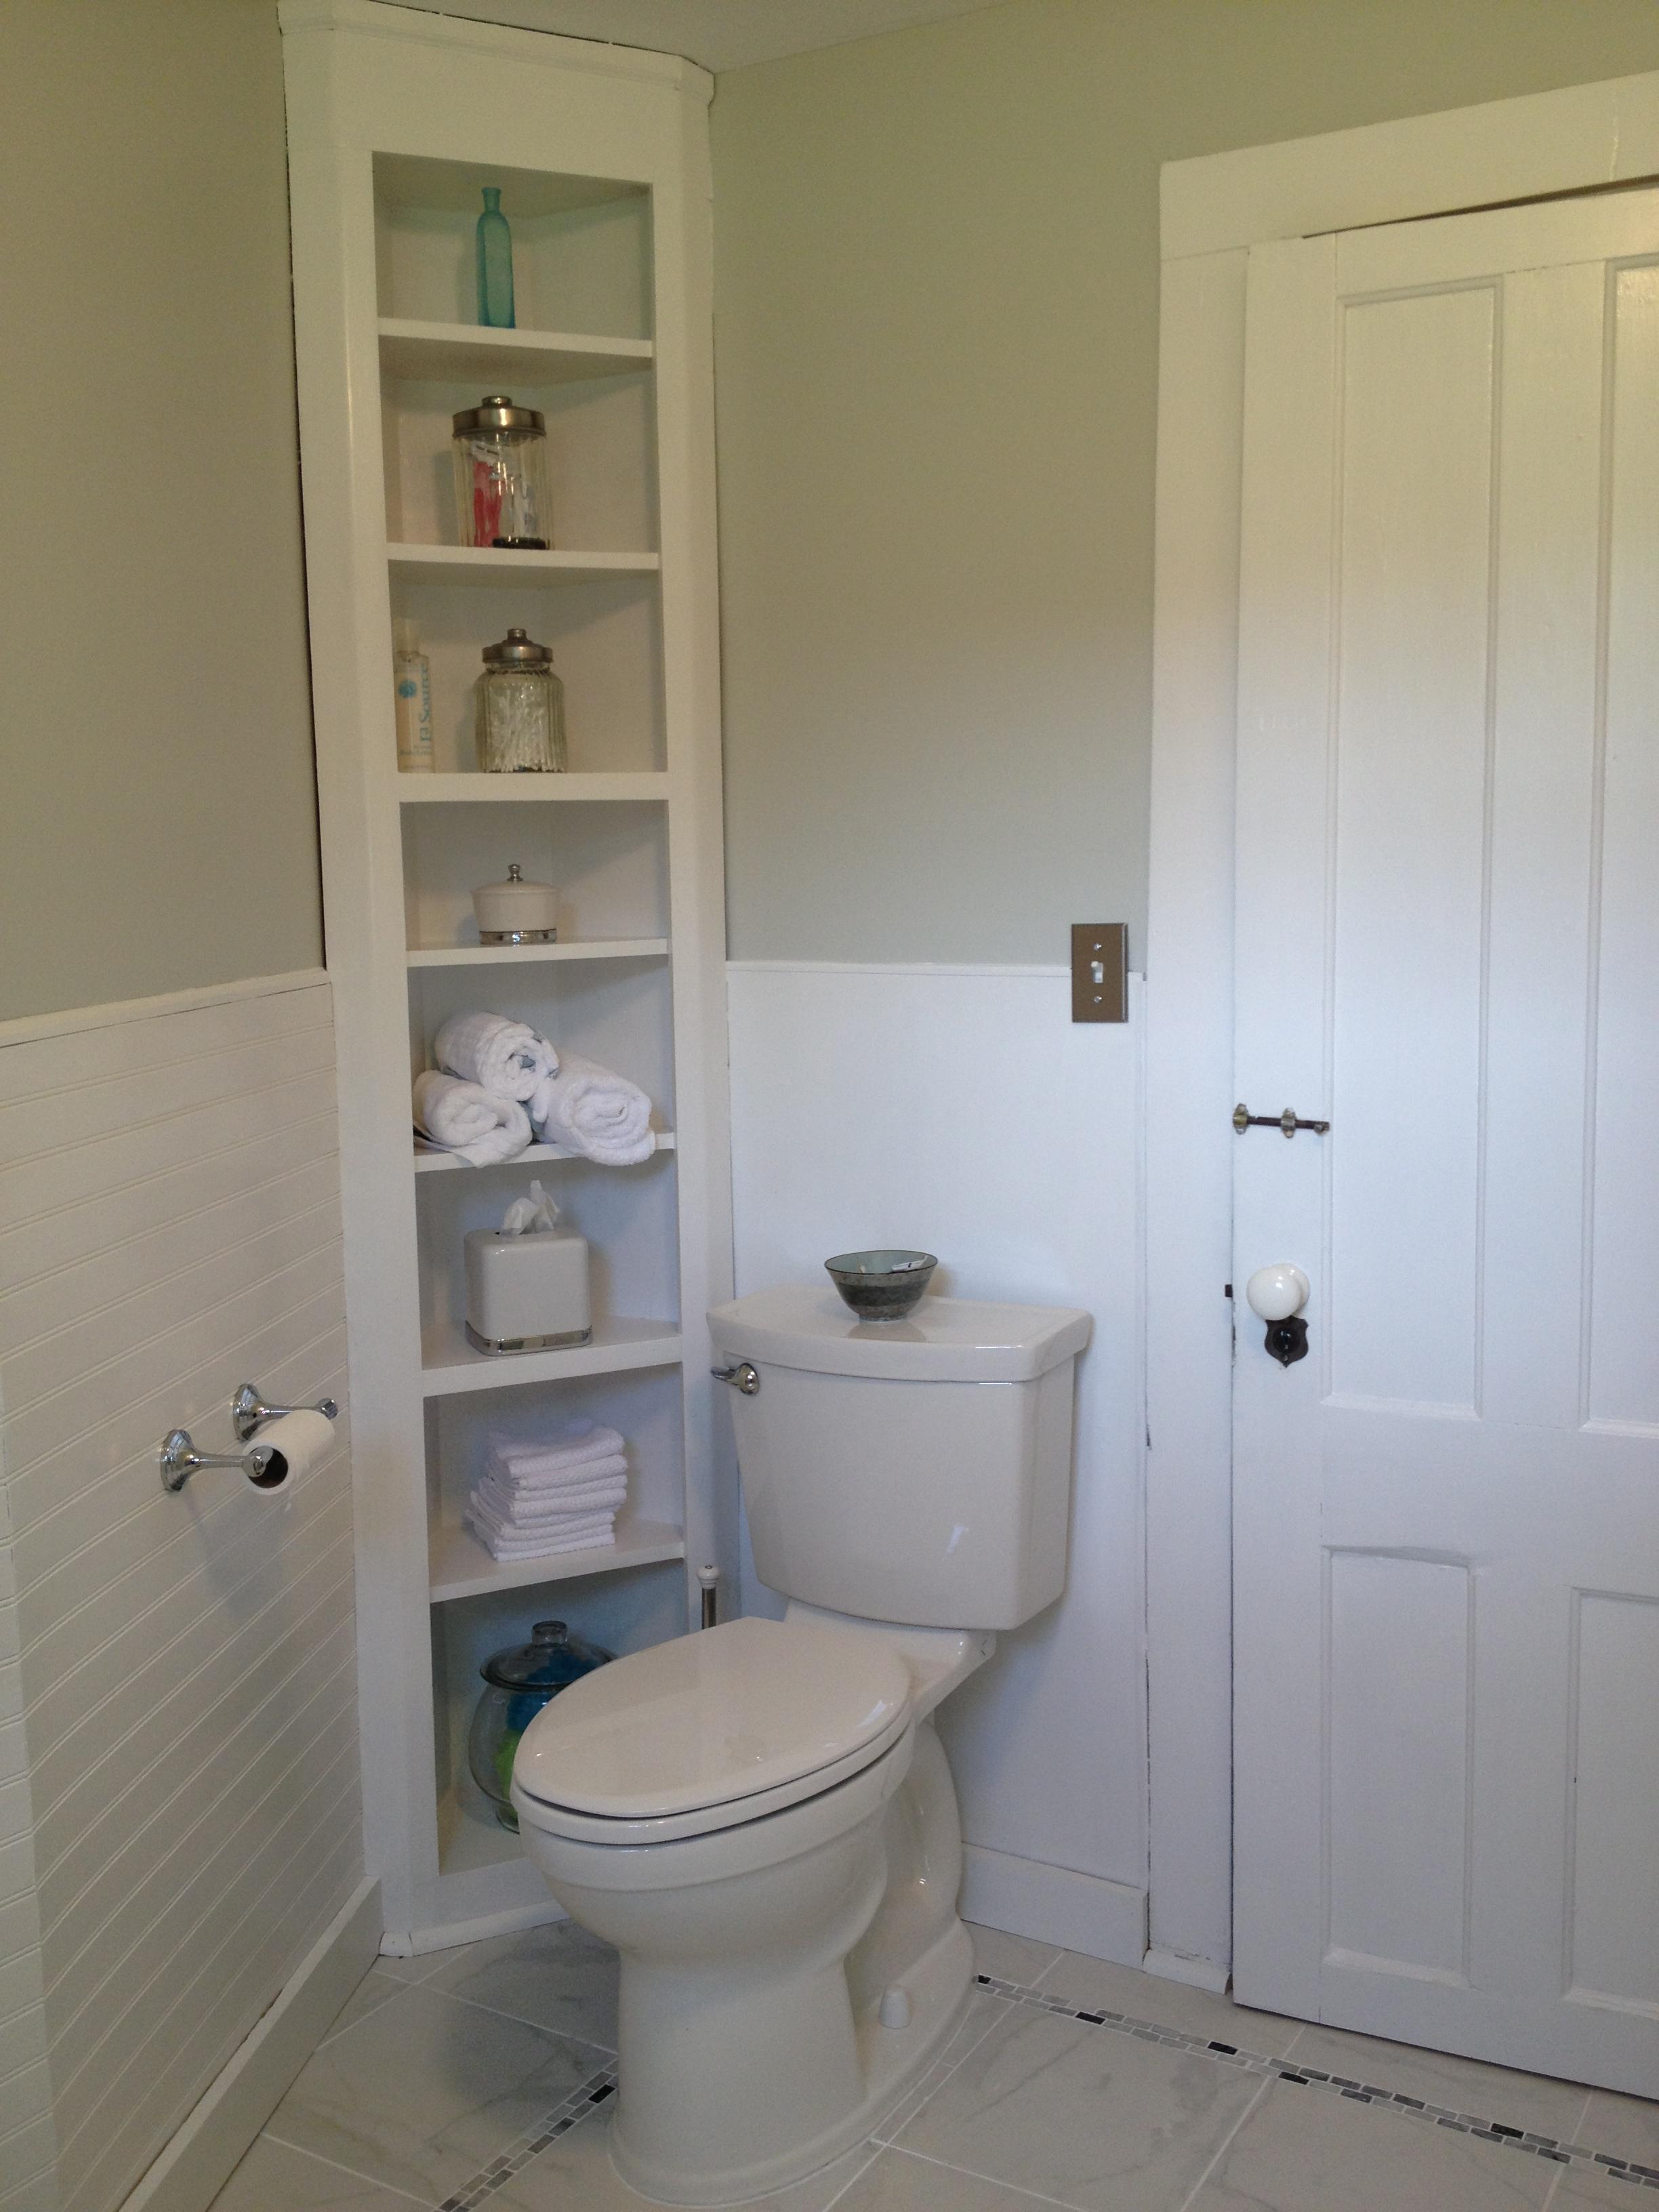 Bathroom Corner Cabinet | Mystical Designs and Tags